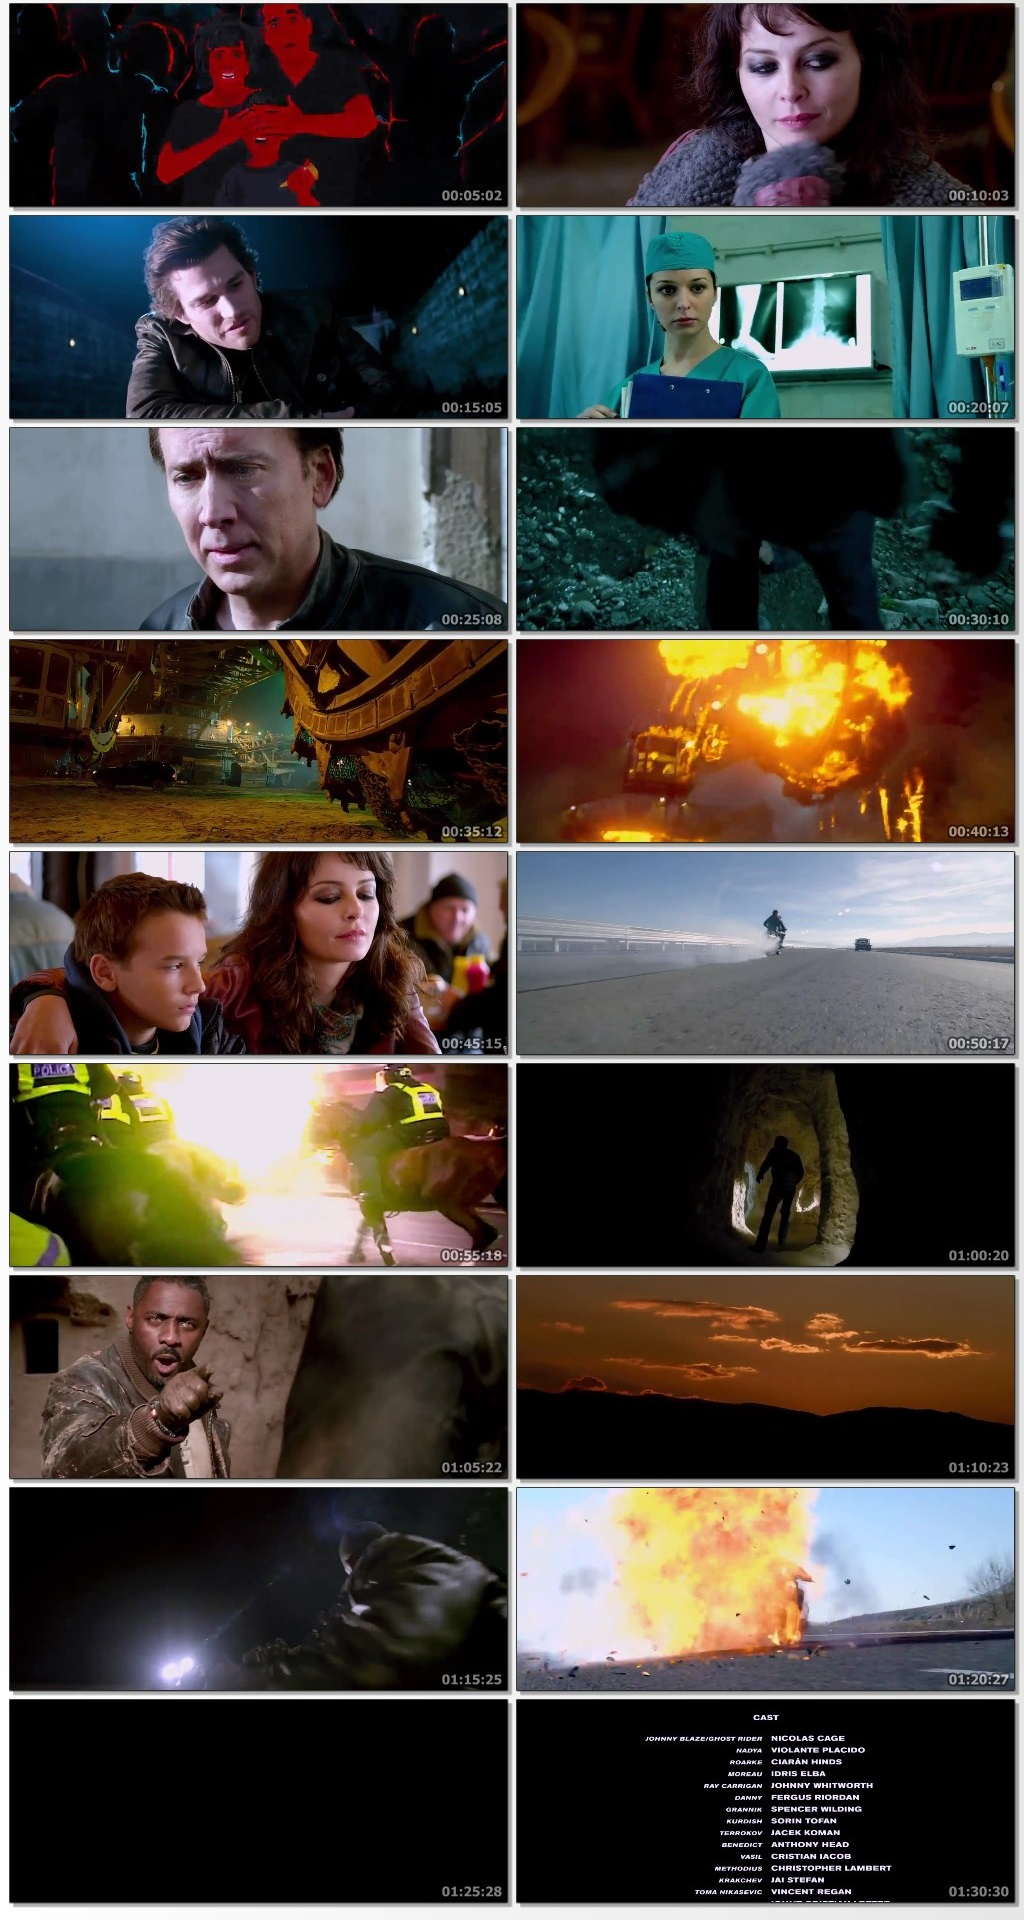 Ghost-Rider-Spirit-of-Vengeance-2011-www-7-Star-HD-Dev-Hindi-Dual-Audio-720p-Blu-Ray-ESubs-700-MB-1-